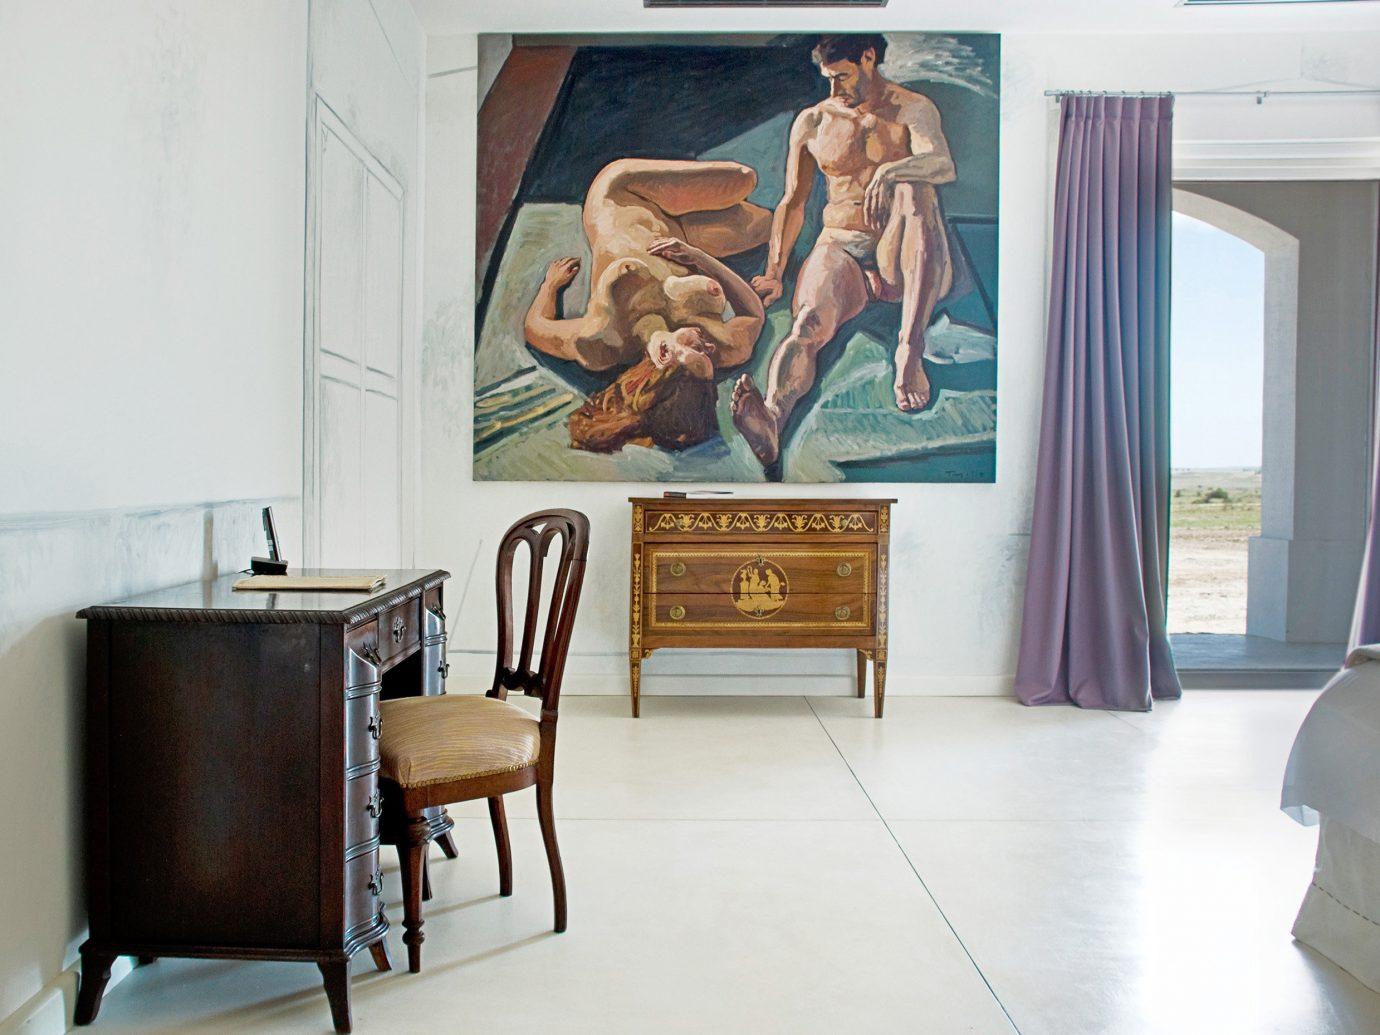 Beach Romantic Getaways south america Trip Ideas Uruguay floor indoor room interior design home art Design tourist attraction modern art furniture